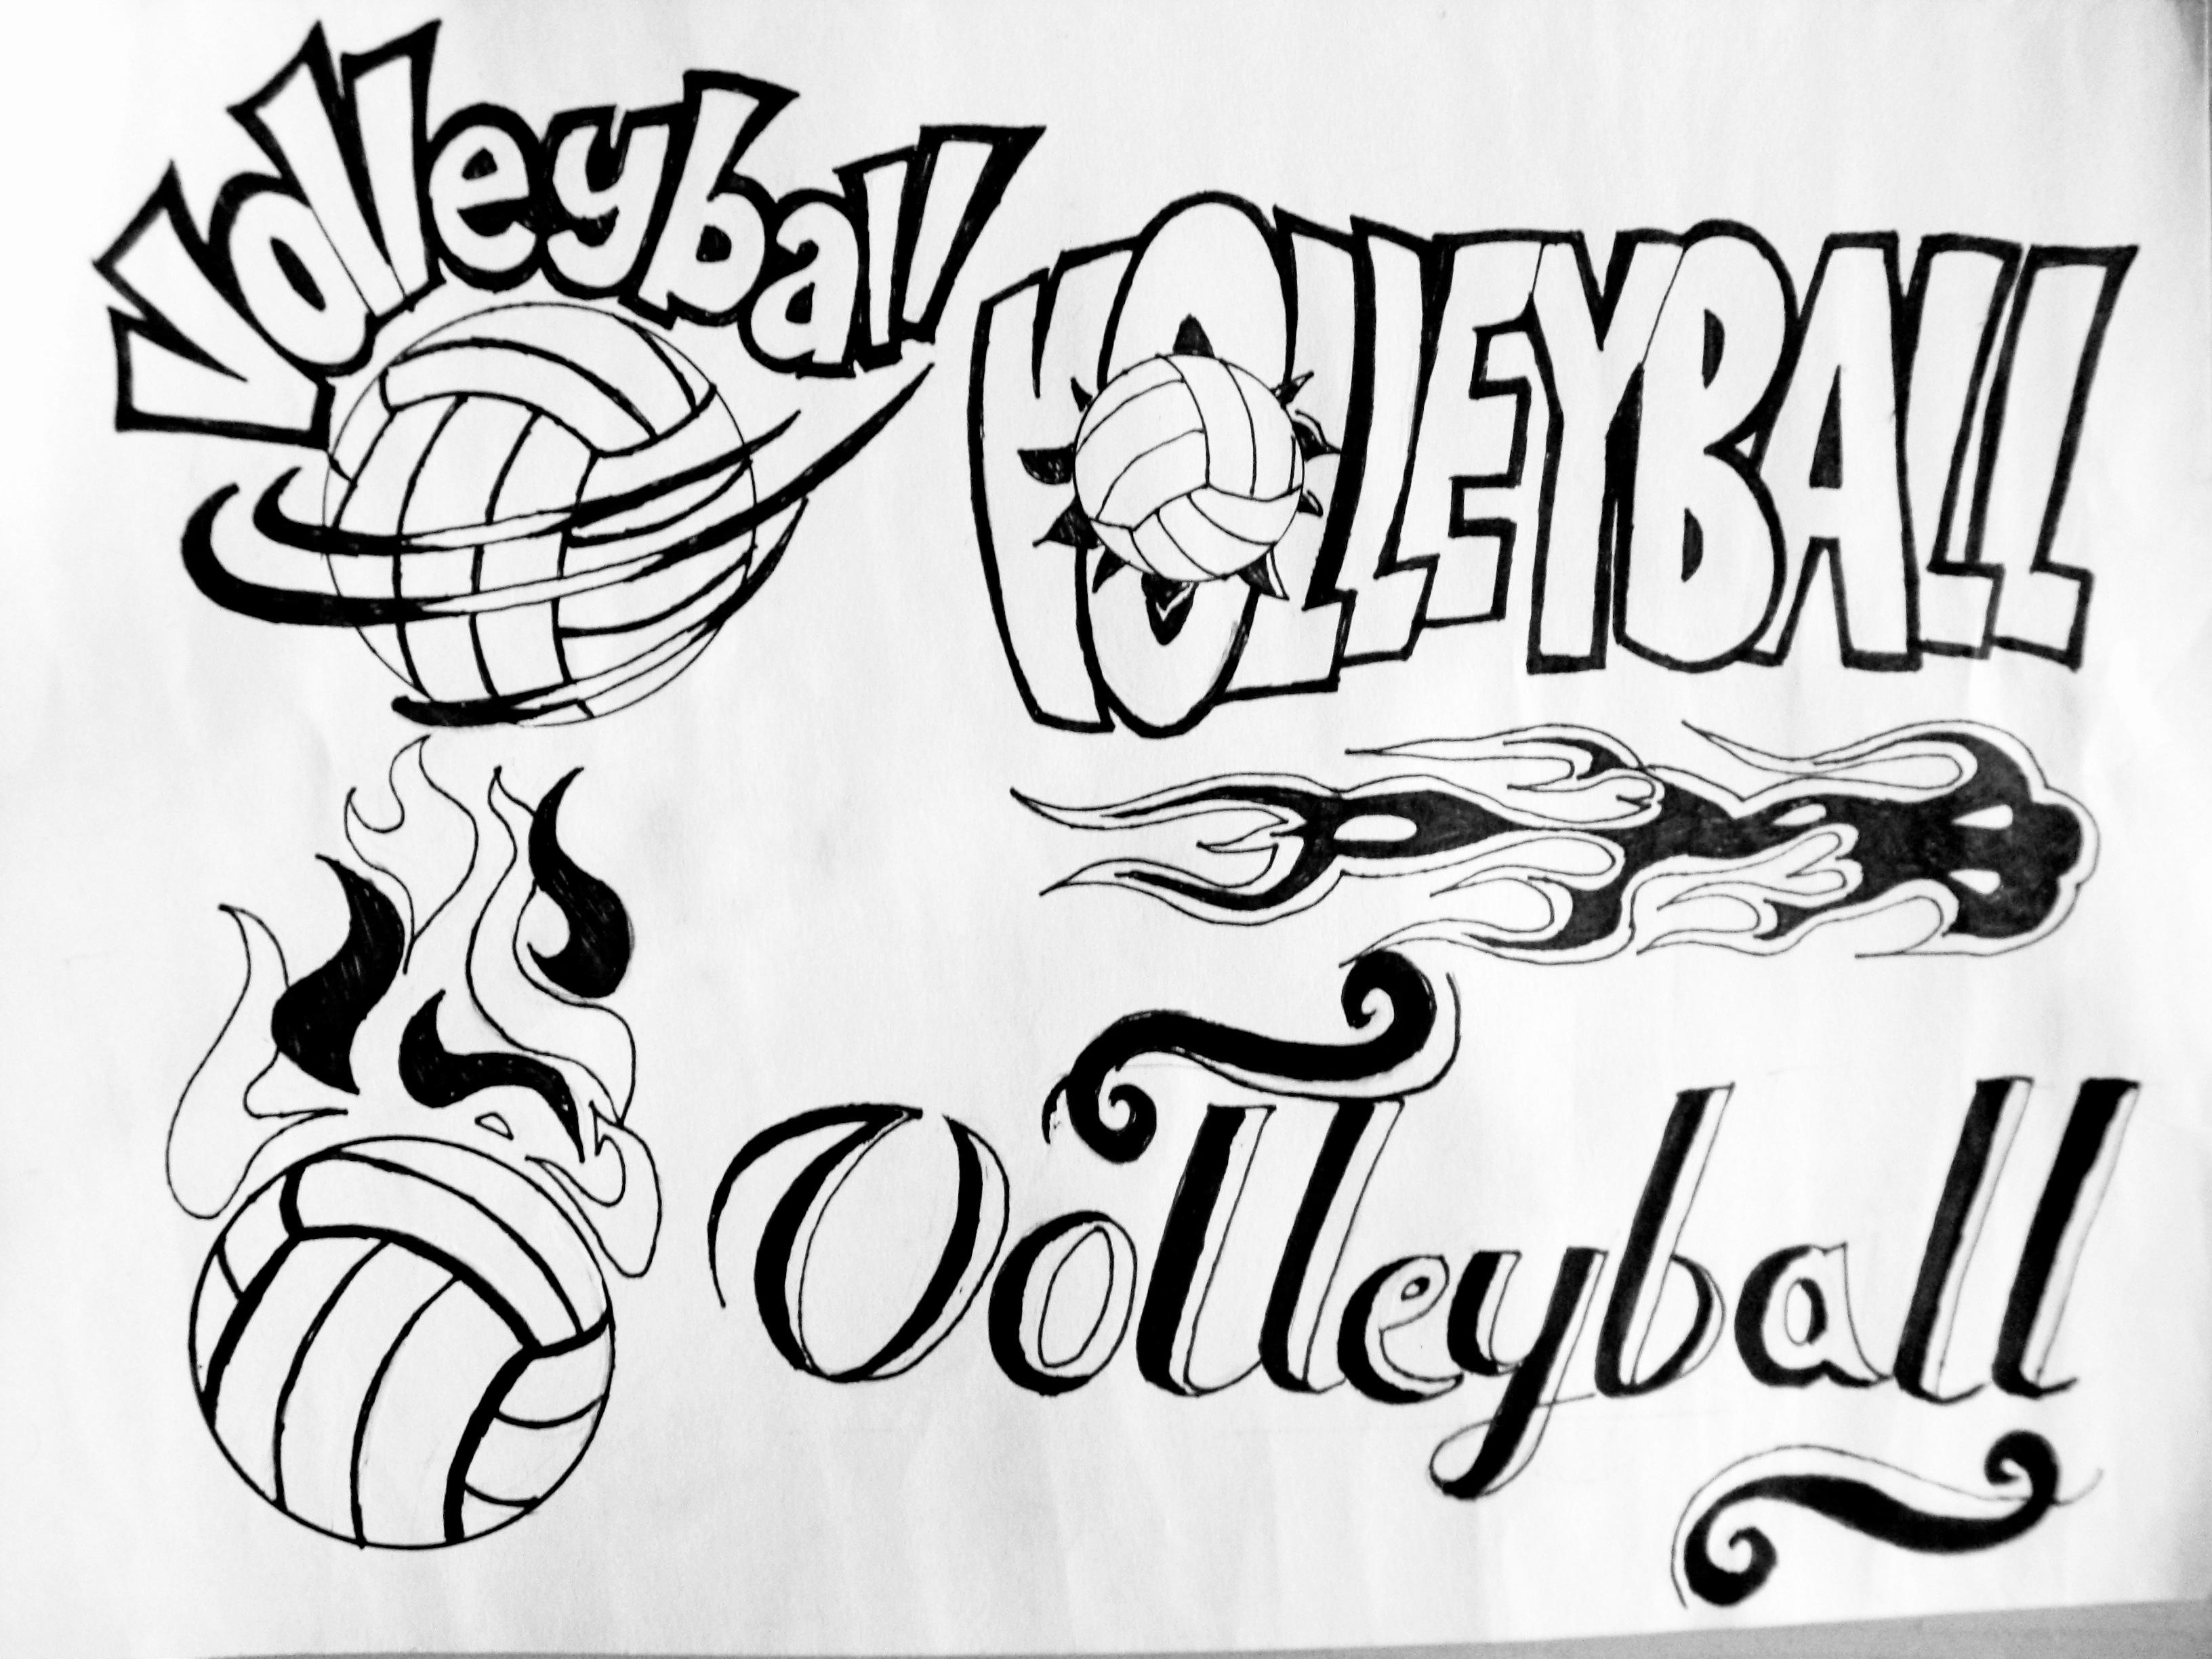 3264x2448 Volleyball Volleyball Volleyball